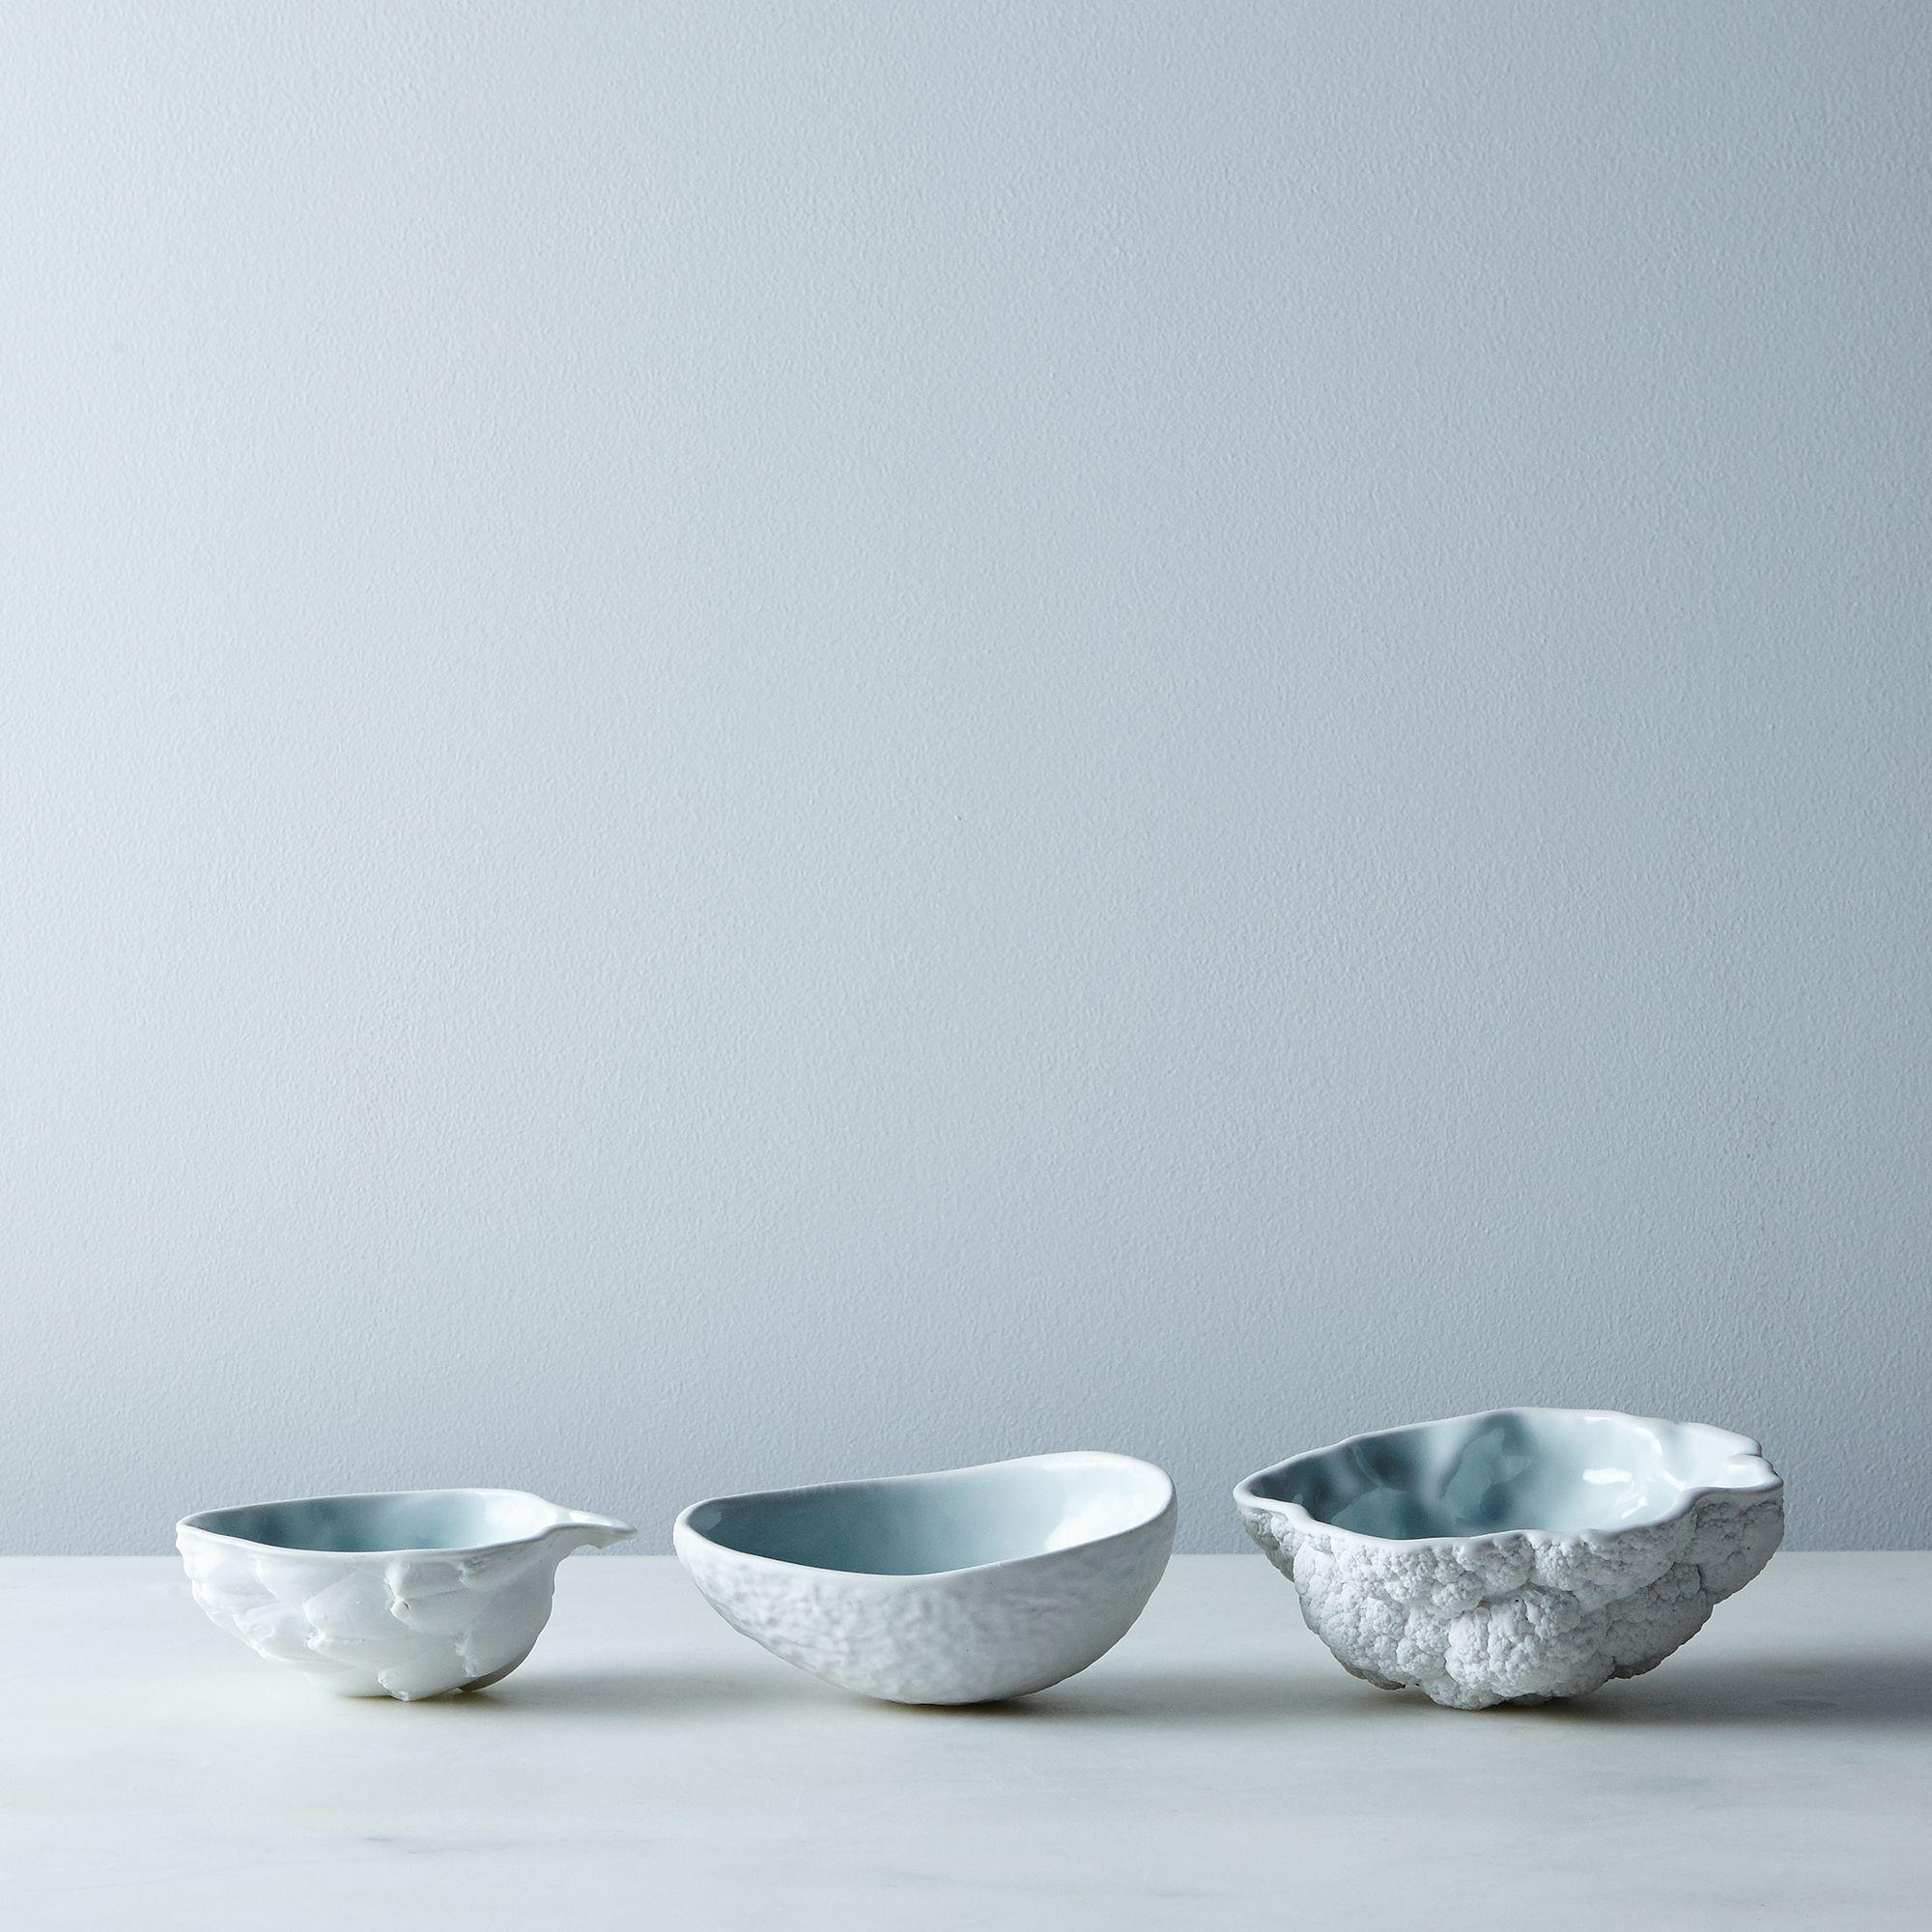 B7f82314 a05a 499c a179 3e0db452b395  2015 0605 heirloom cauliflower artichoke avocado bowls set of 3 silo rocky luten 019